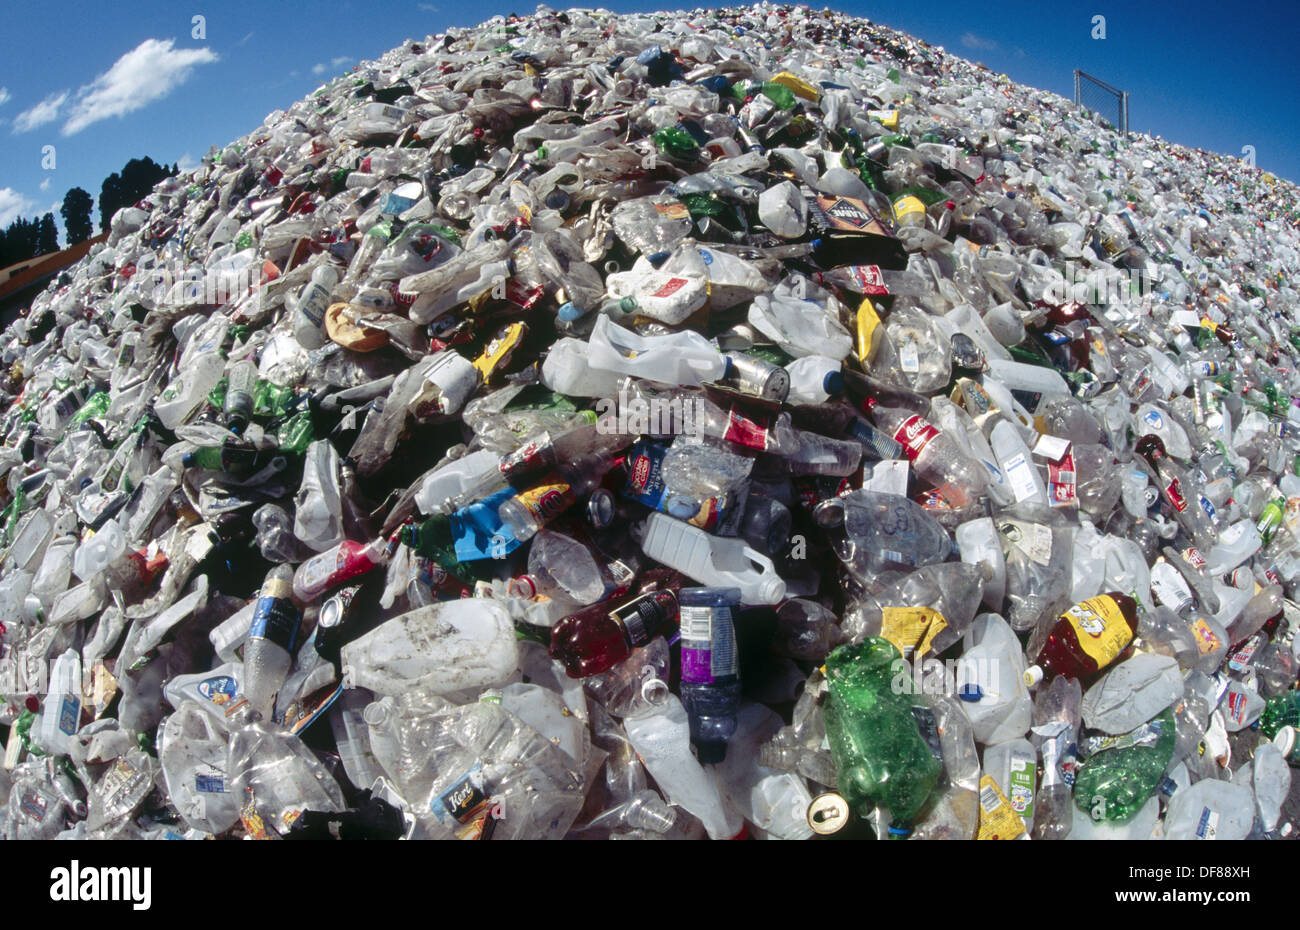 Montaña de plástico. Las botellas de plástico recolectadas para ...